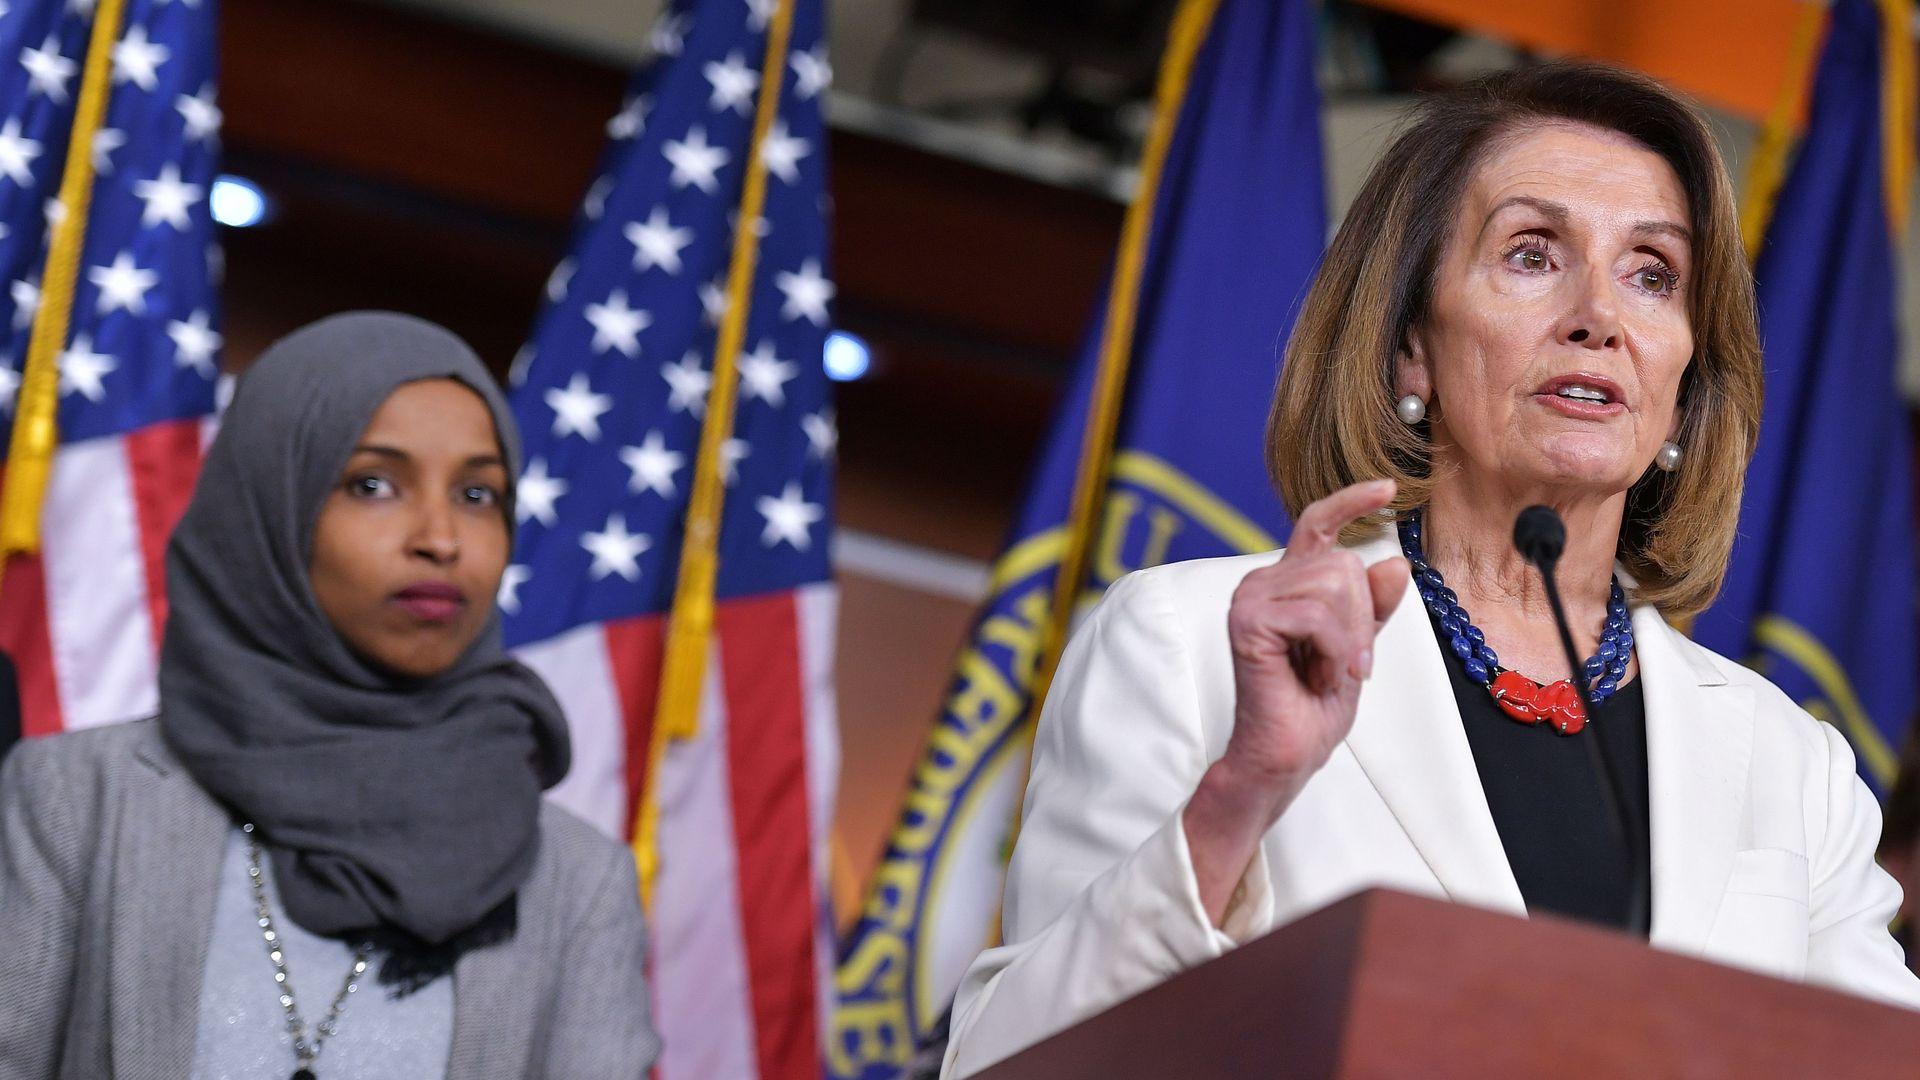 House Speaker Nancy Pelosi and Rep. Ilhan Omar (D-Minn.)